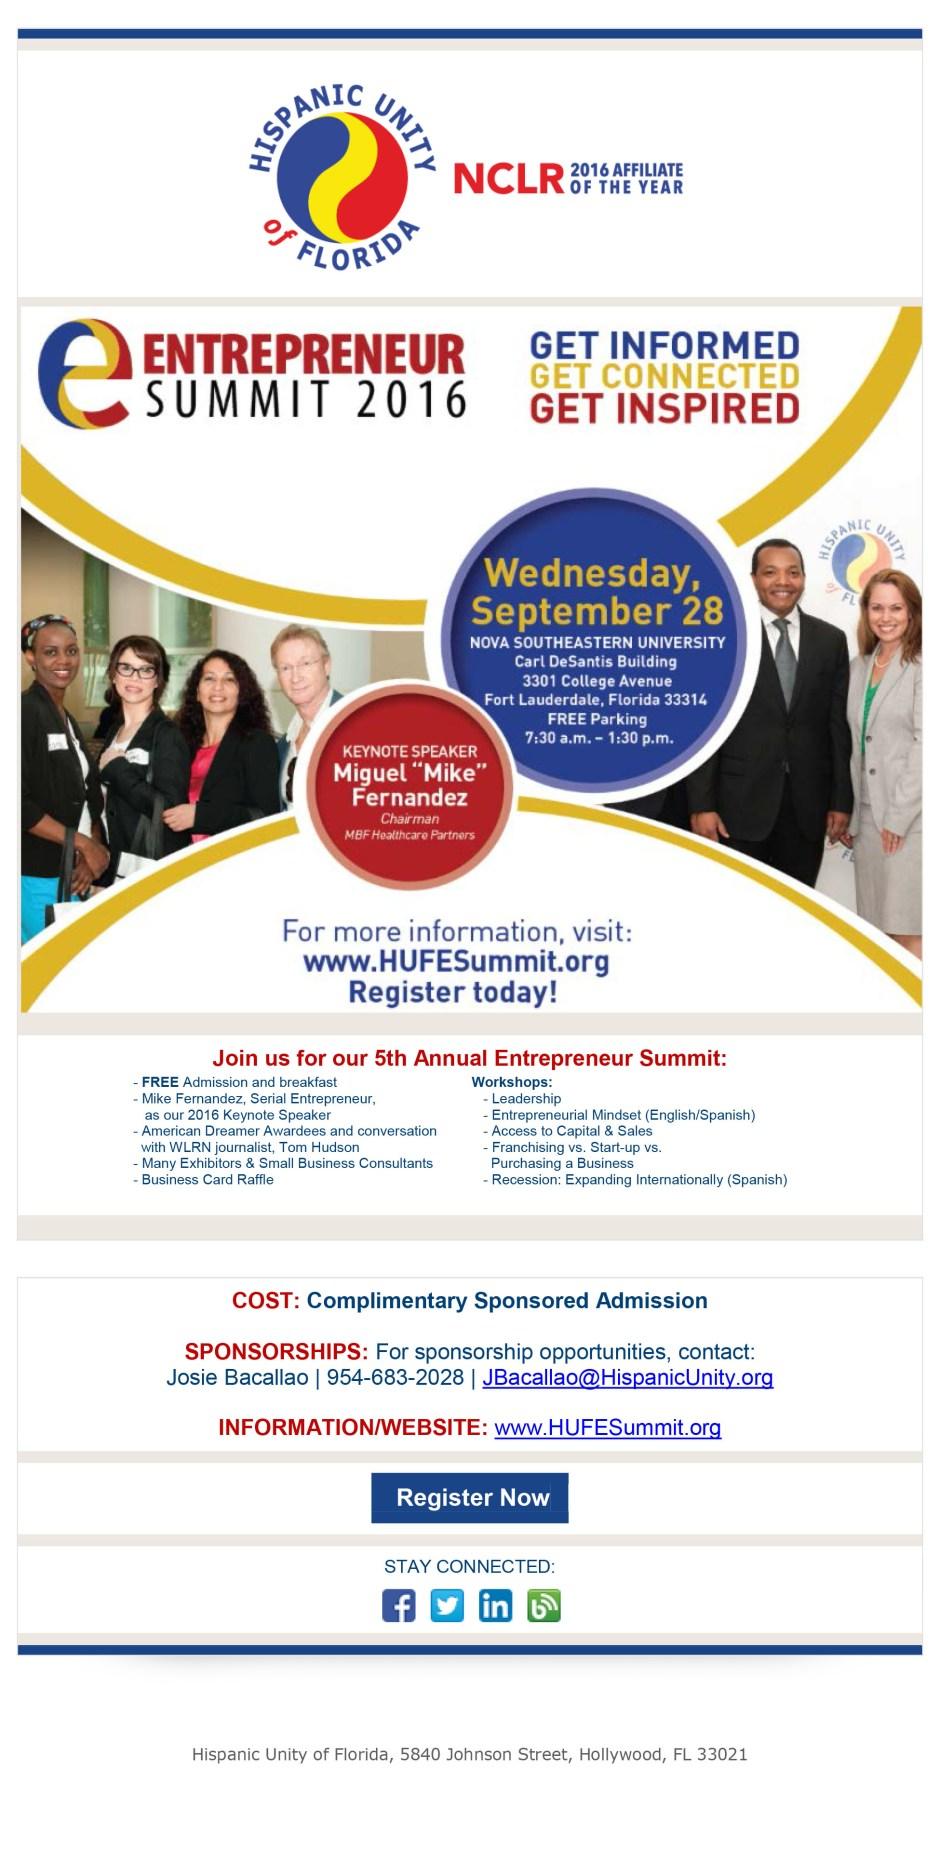 Hispanic Unity Entrepreneur Summit 2016